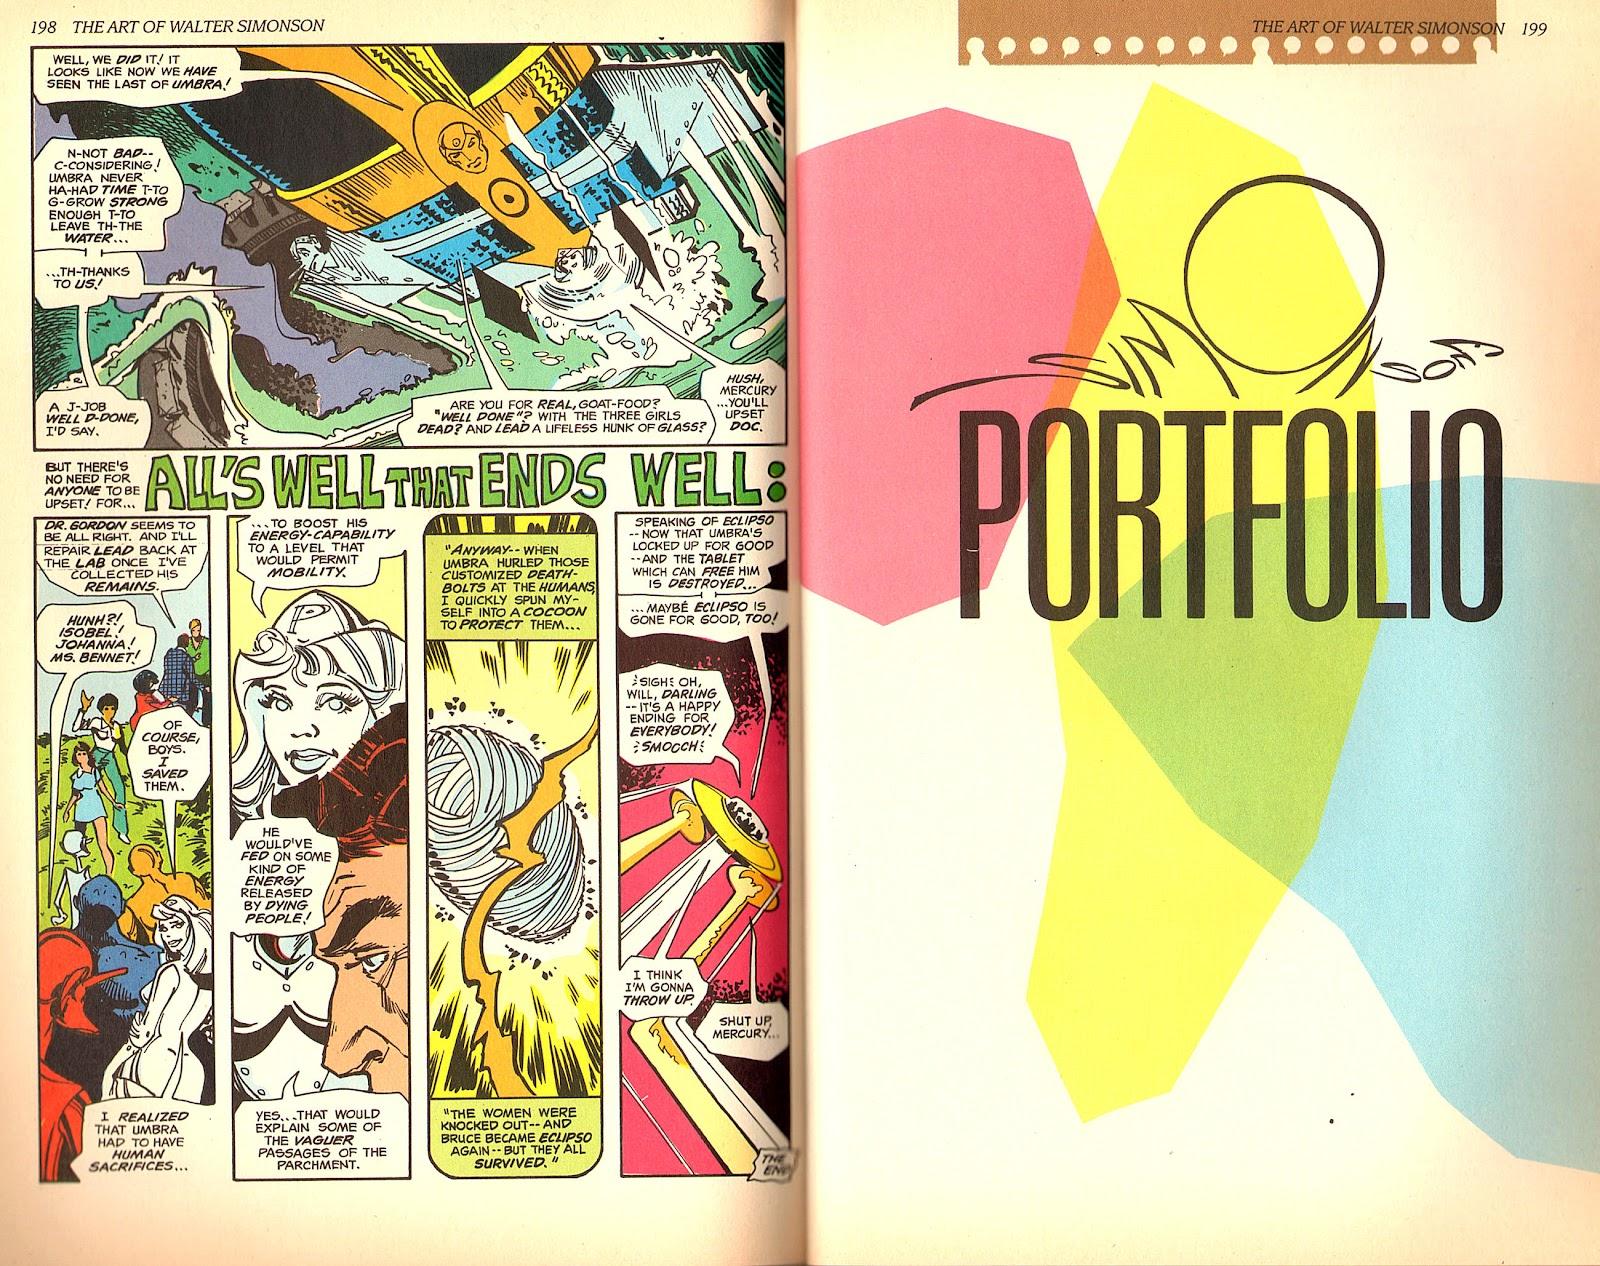 Read online The Art of Walter Simonson comic -  Issue # TPB - 101